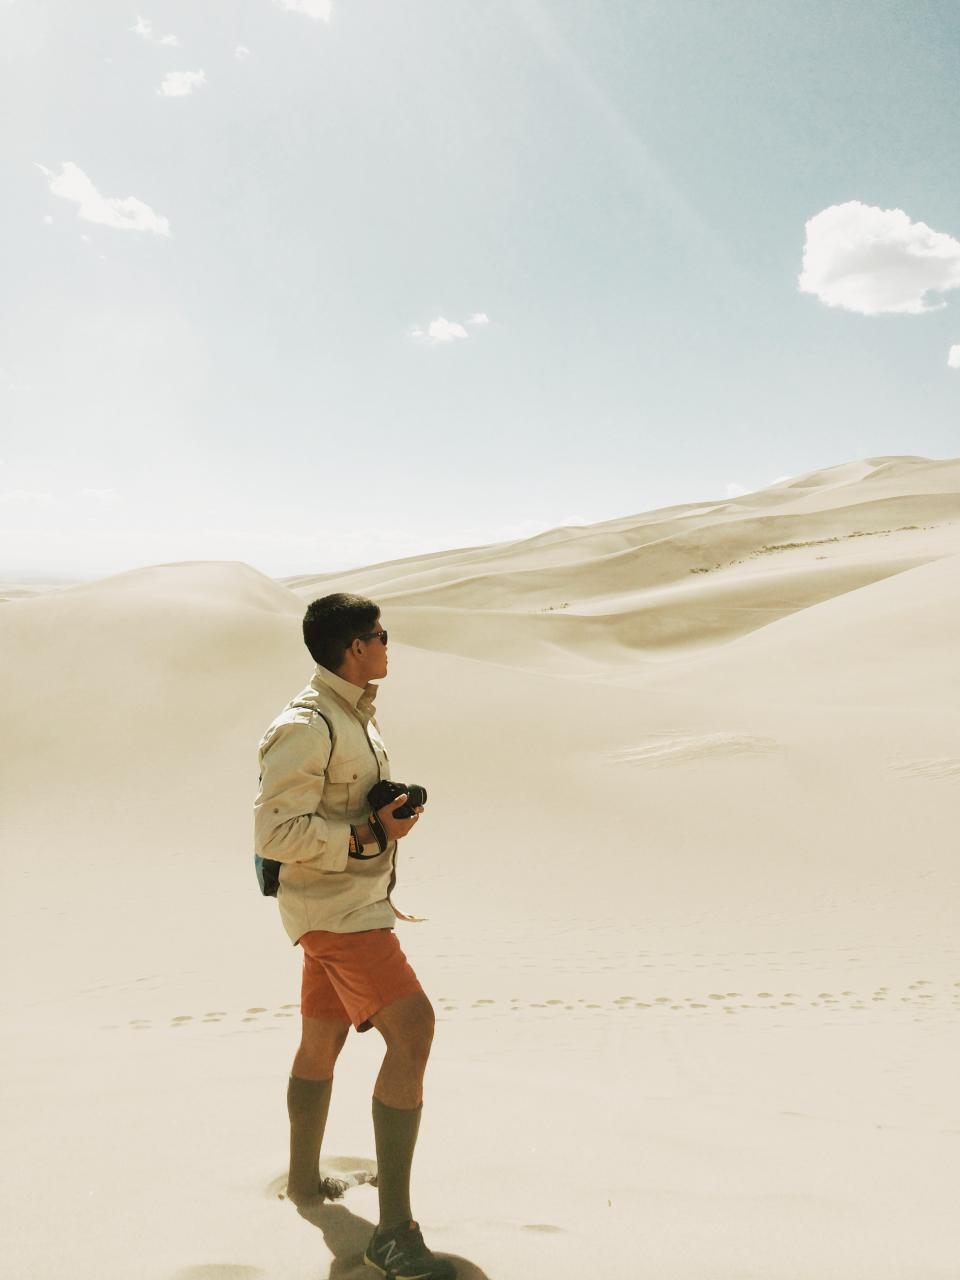 guy, man, sand, dunes, desert, shorts, camera, photographer, sunshine, blue, sky